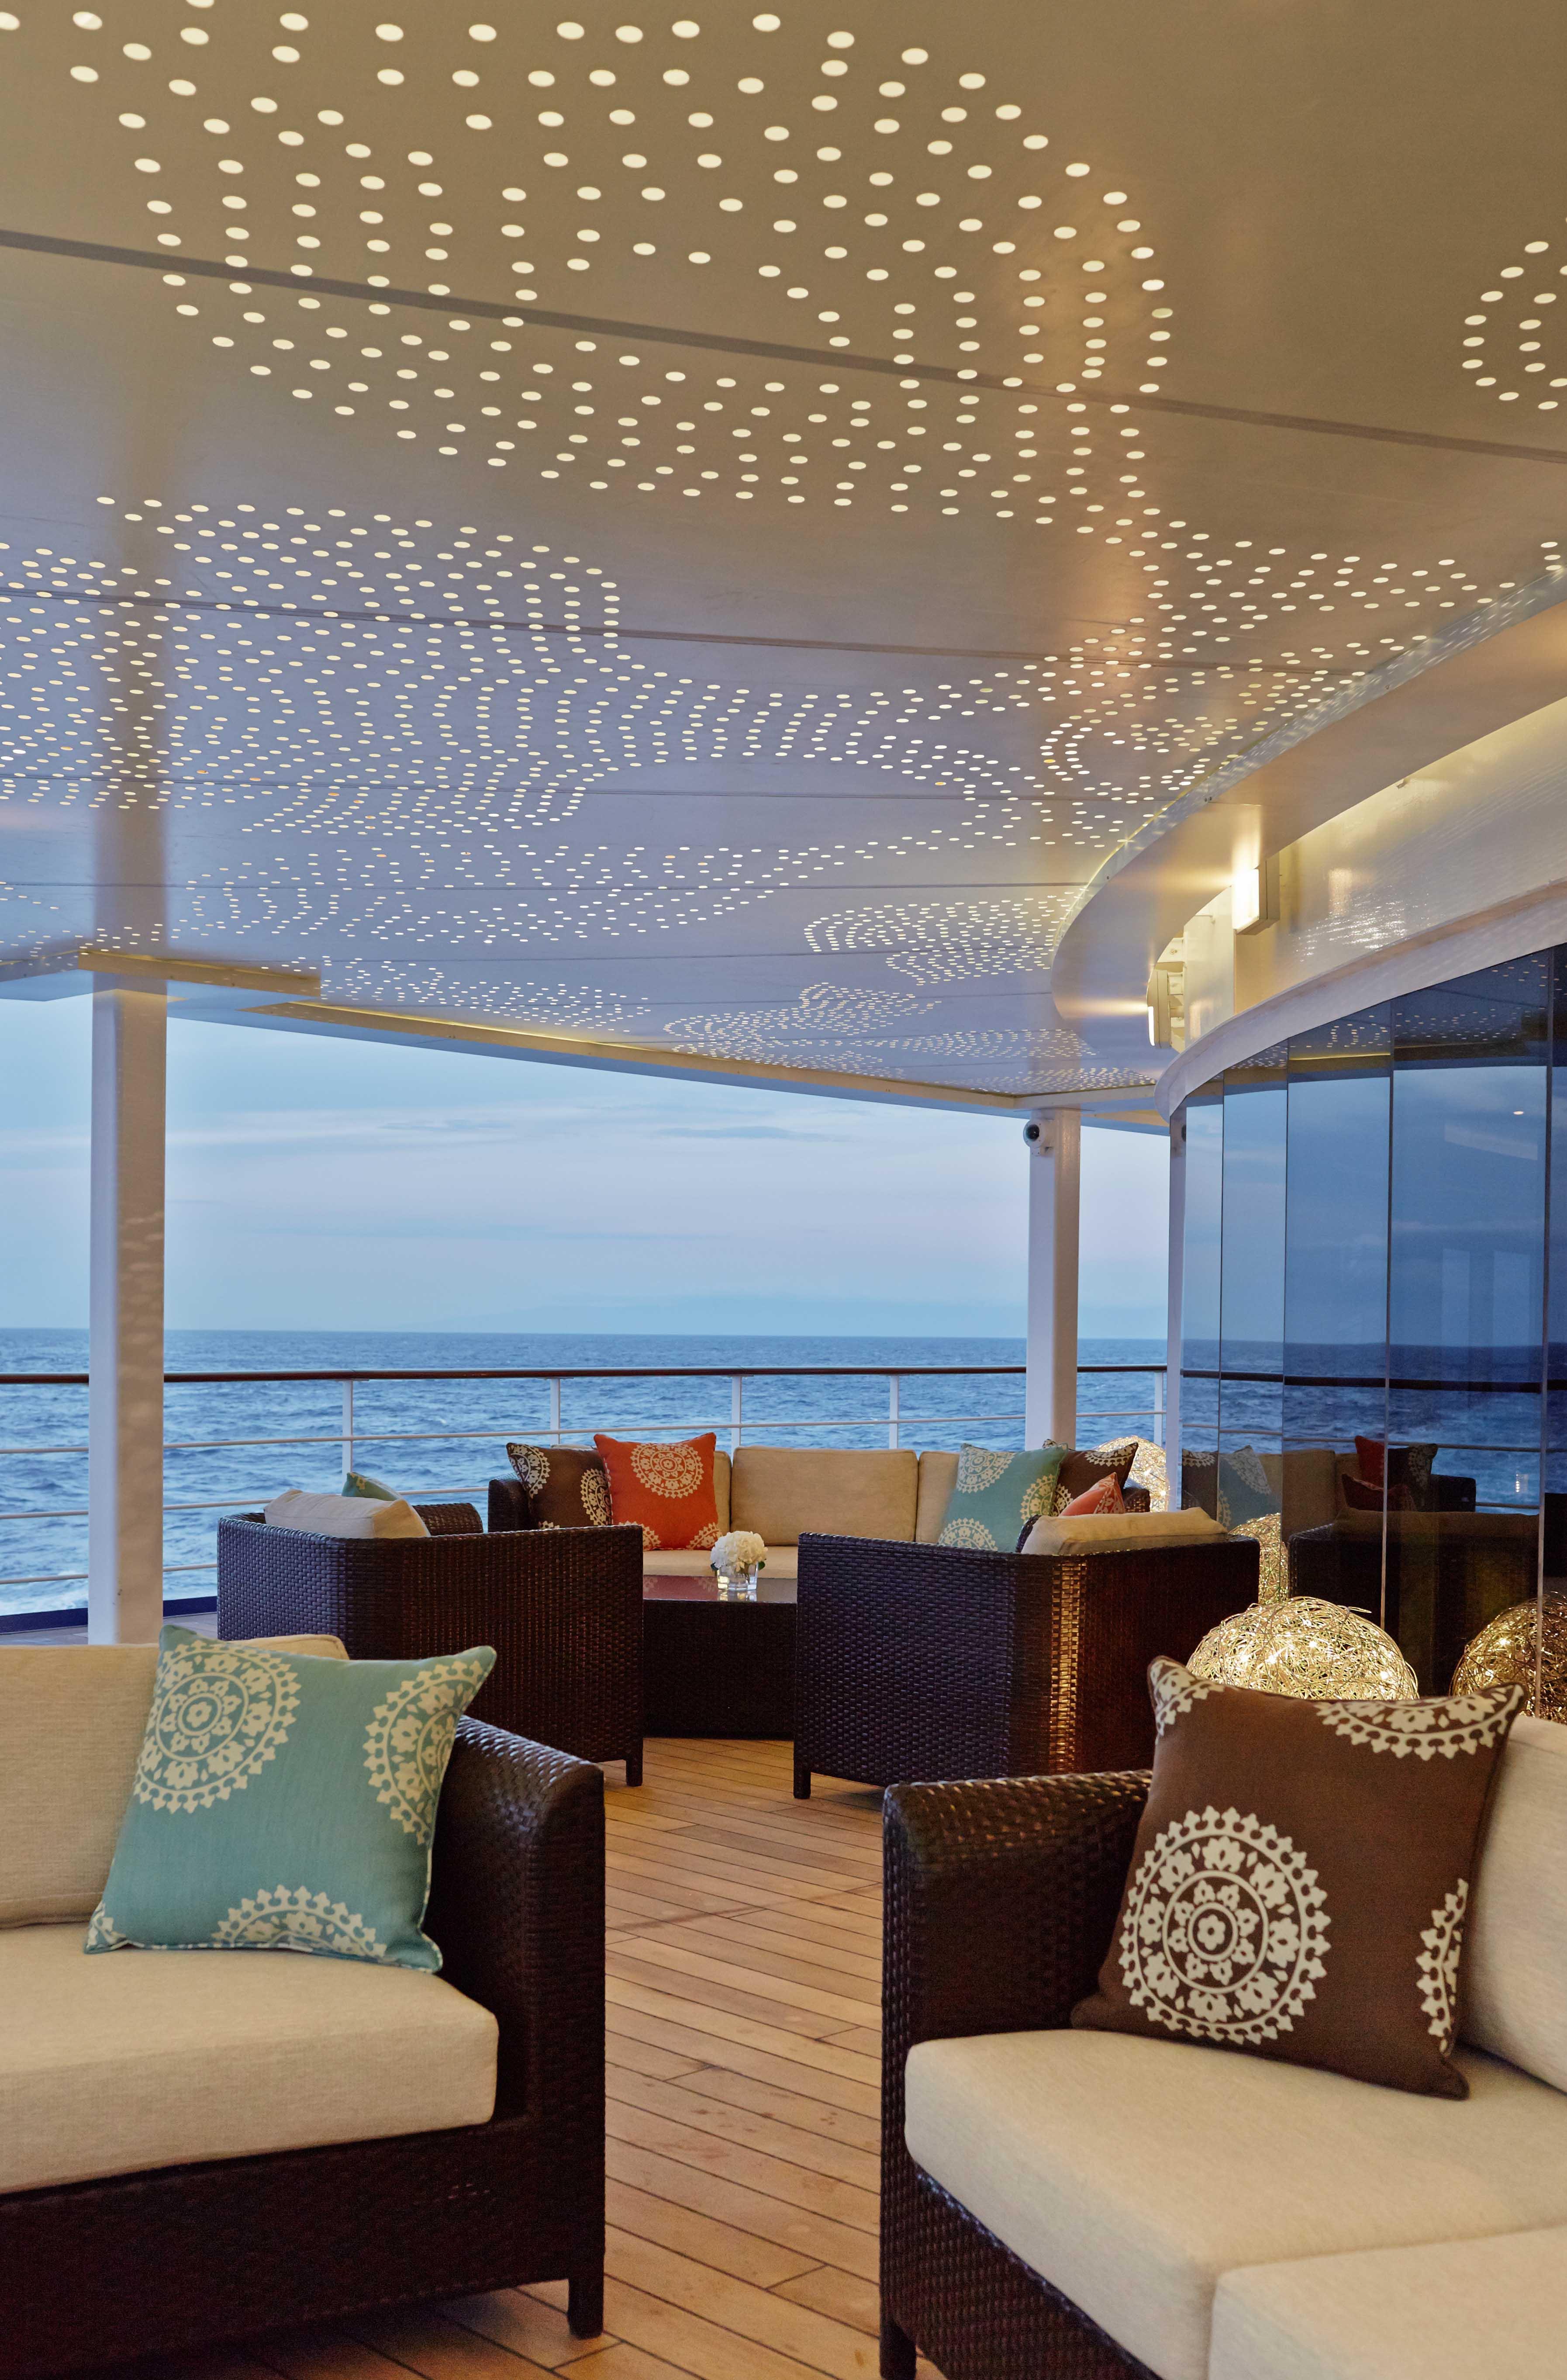 Seven Seas Mariner - Horizon Lounge aft deck